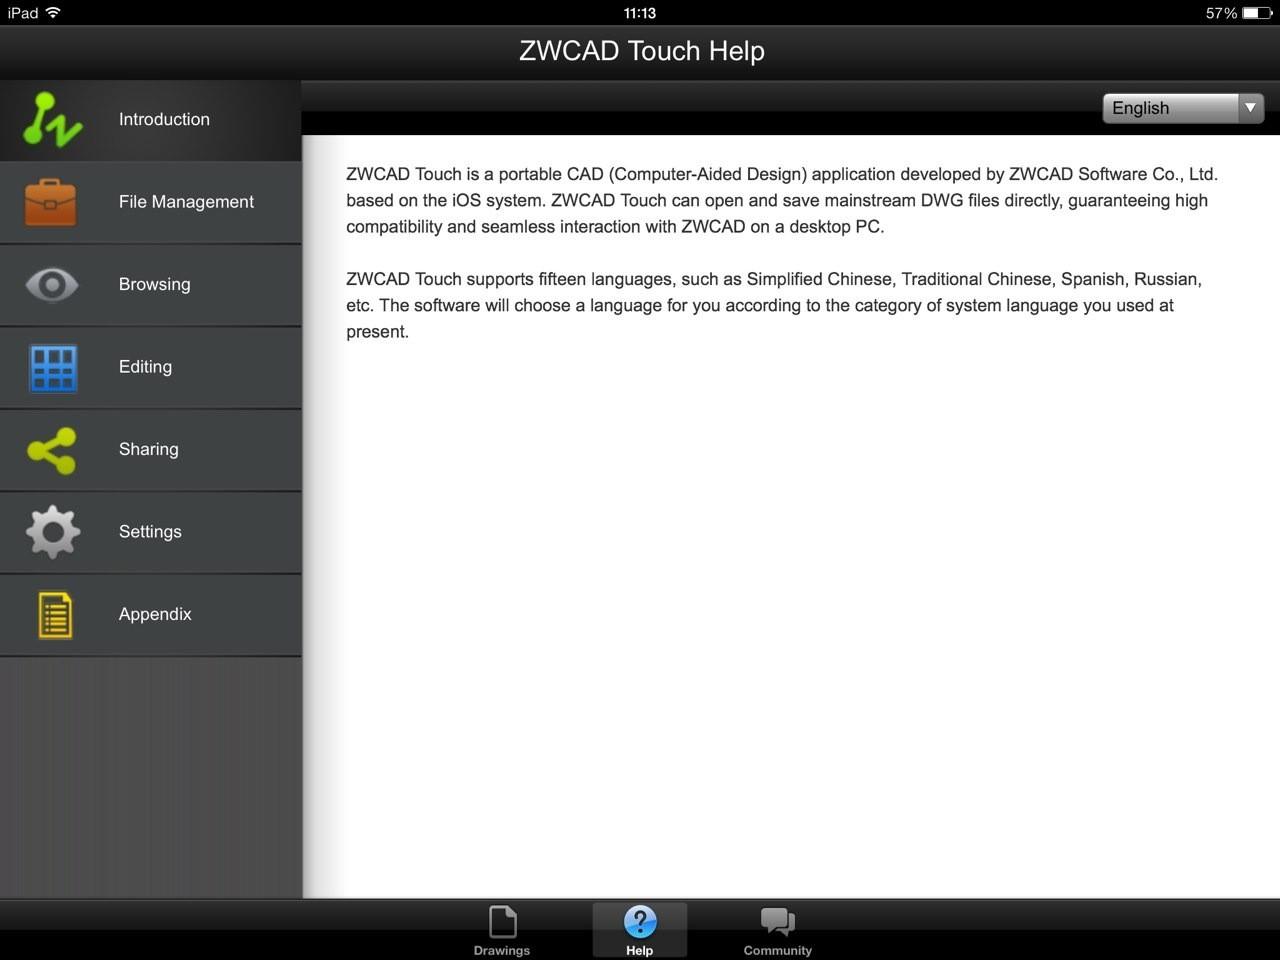 ZWCAD Touchのアップデート版をリリースしました---コミュニティ機能ととユーザービリティーが向上